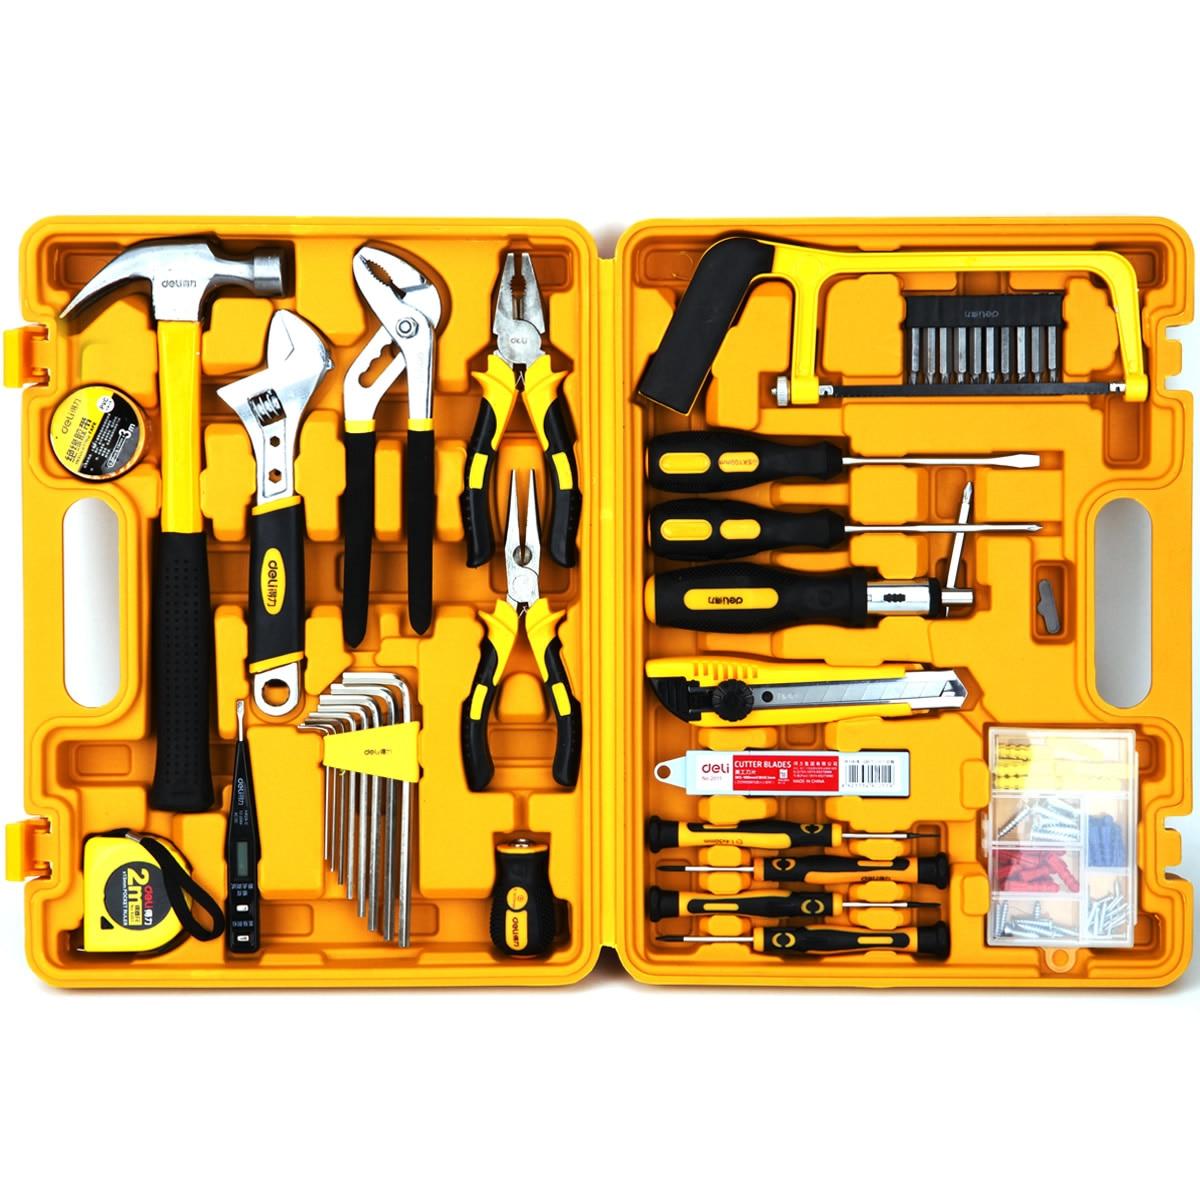 Multi-purpose Combination Tool Set Household Toolbox Hardware Tool Set 53-piece Tool Set Electrical 3703 enlarge